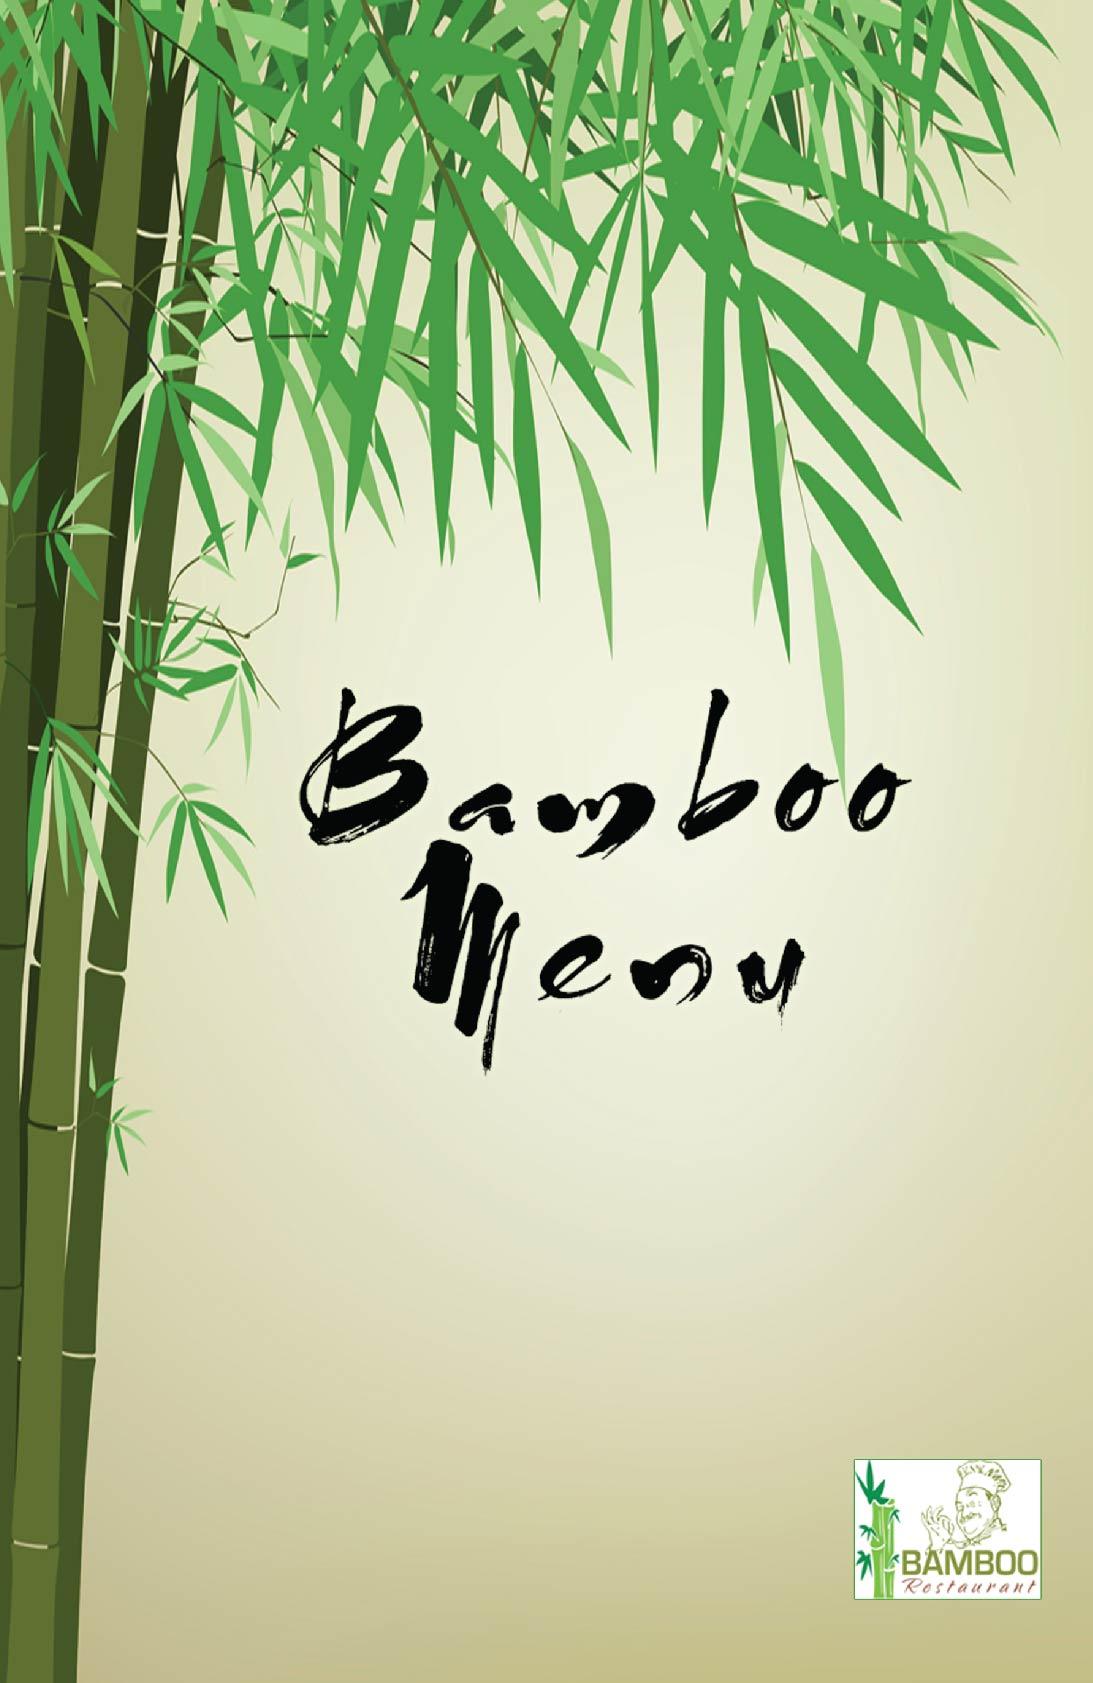 17-10_menu-bamboo-01